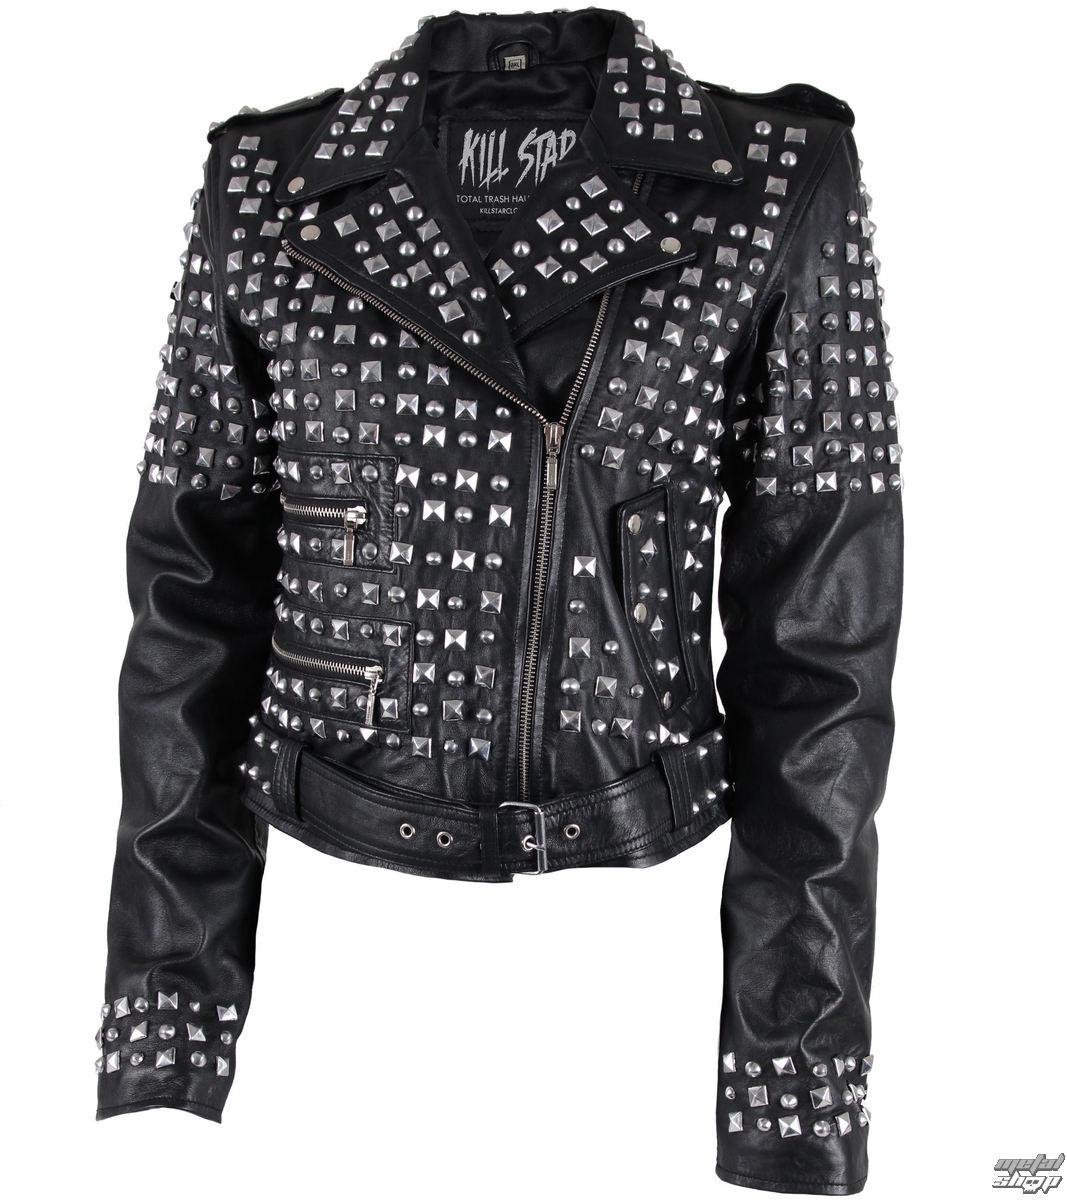 jacket women's (metal jacket) KILLSTAR - Studded Leather - Black